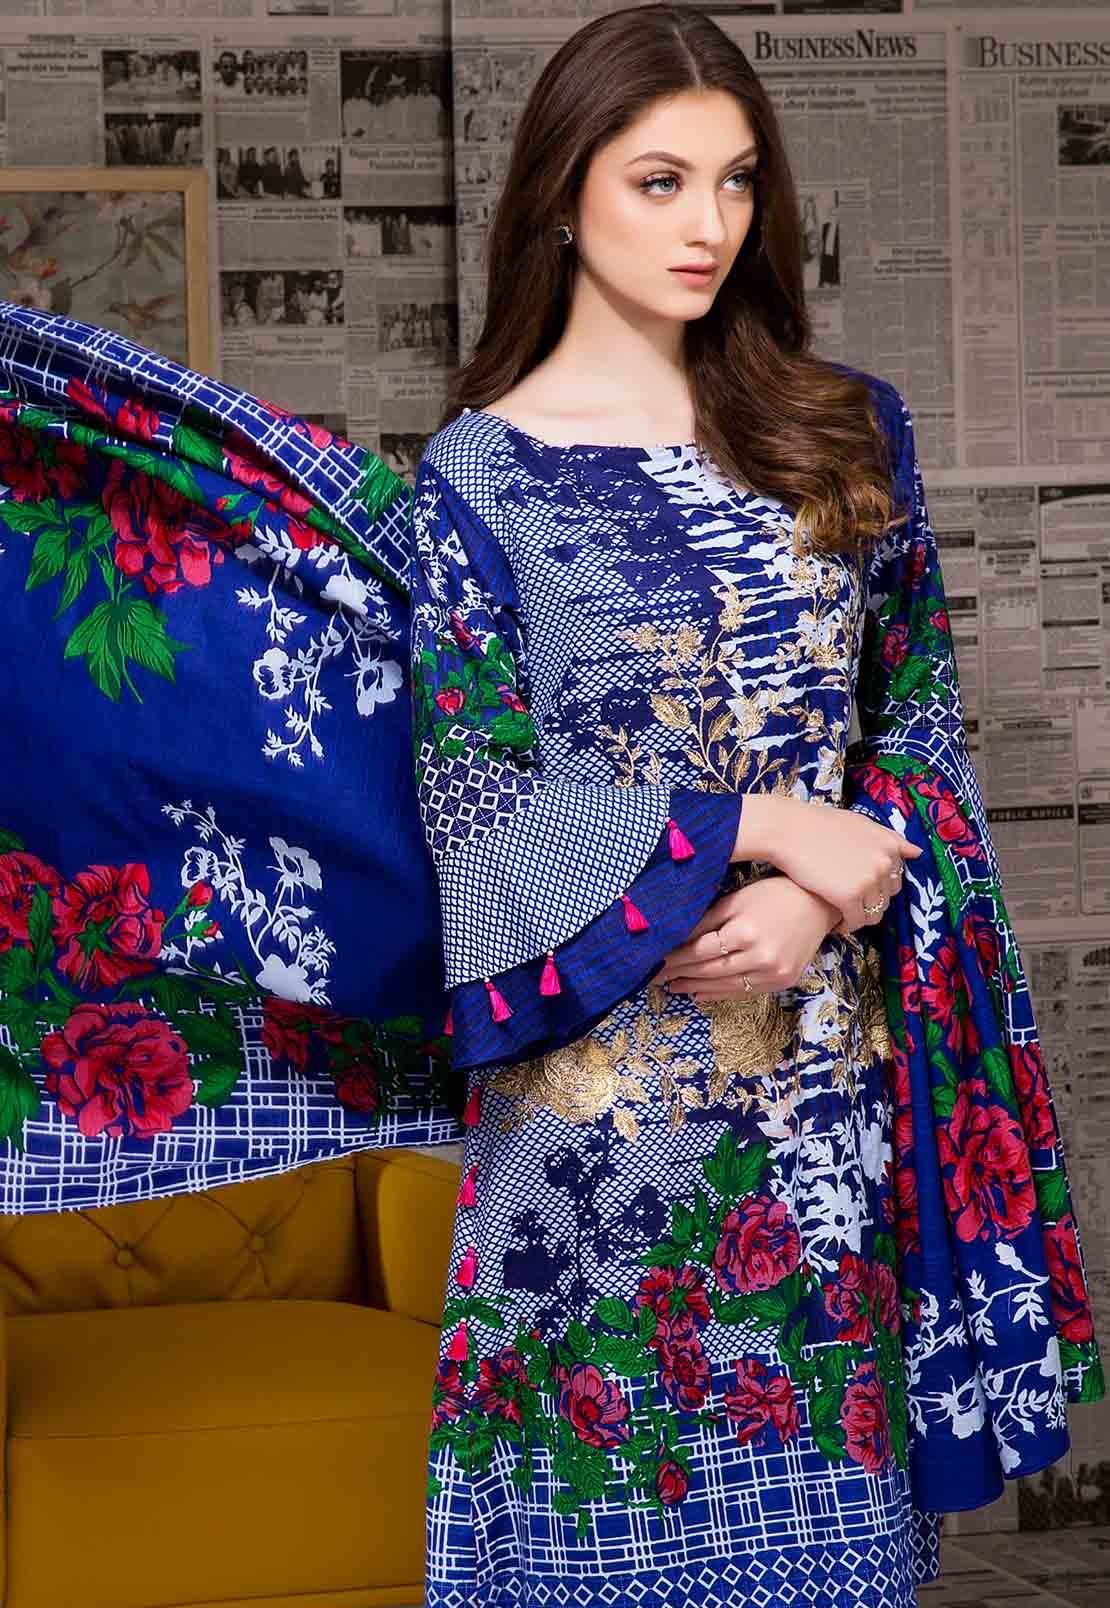 Royal blue Khaddar embroidered three-piece winter dress for anchorwomen